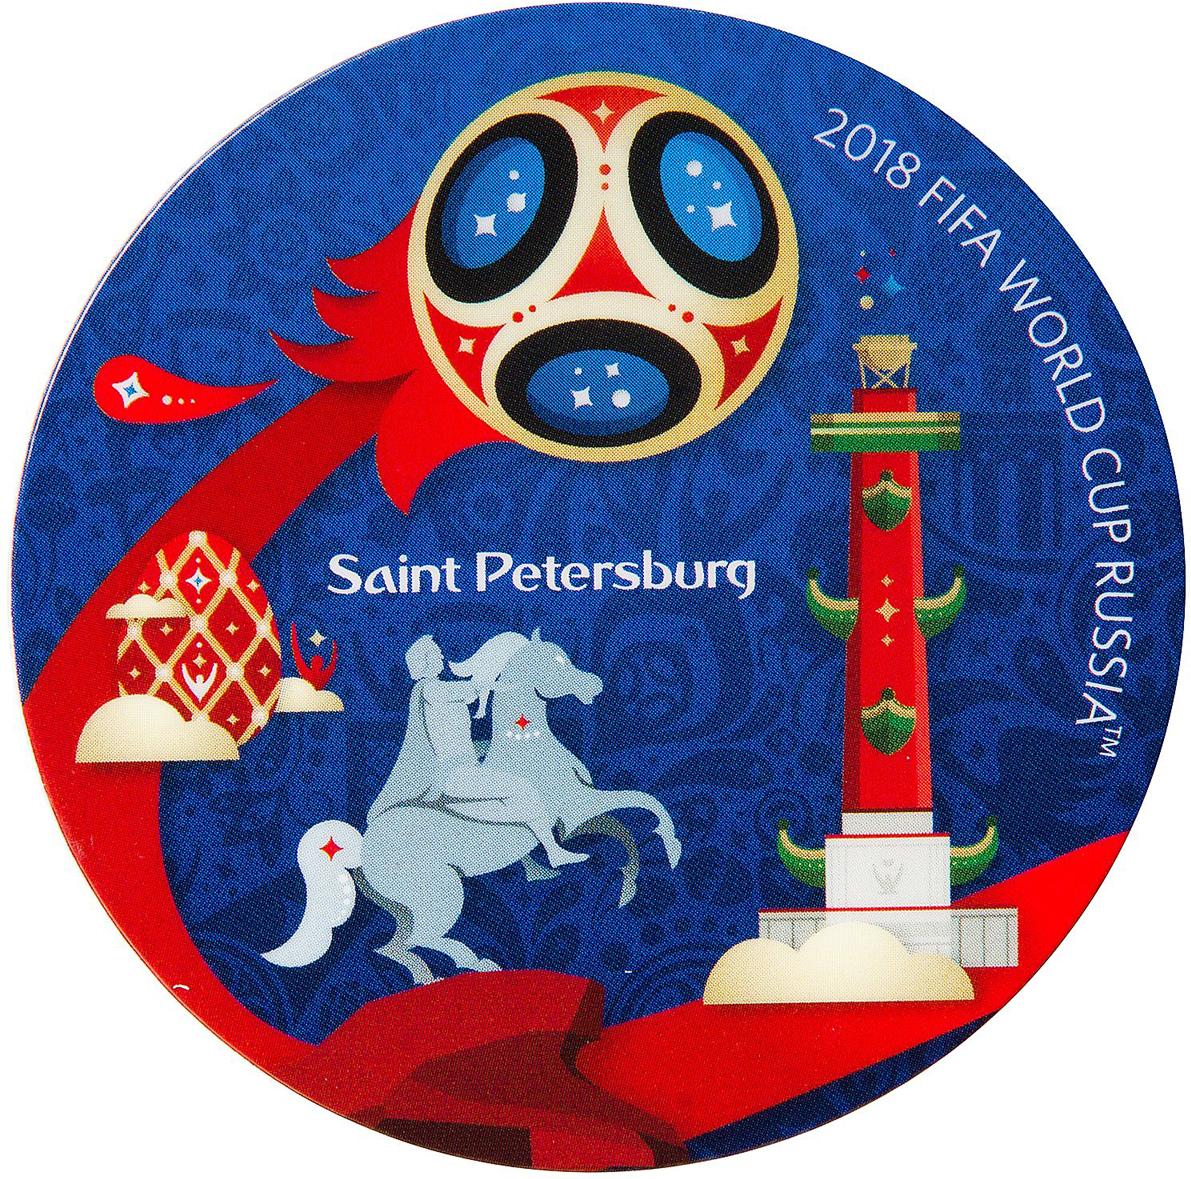 Магнит сувенирный FIFA 2018 Санкт-Петербург, 8 х 11 см. СН502 магнит fifa 2018 россия пвх